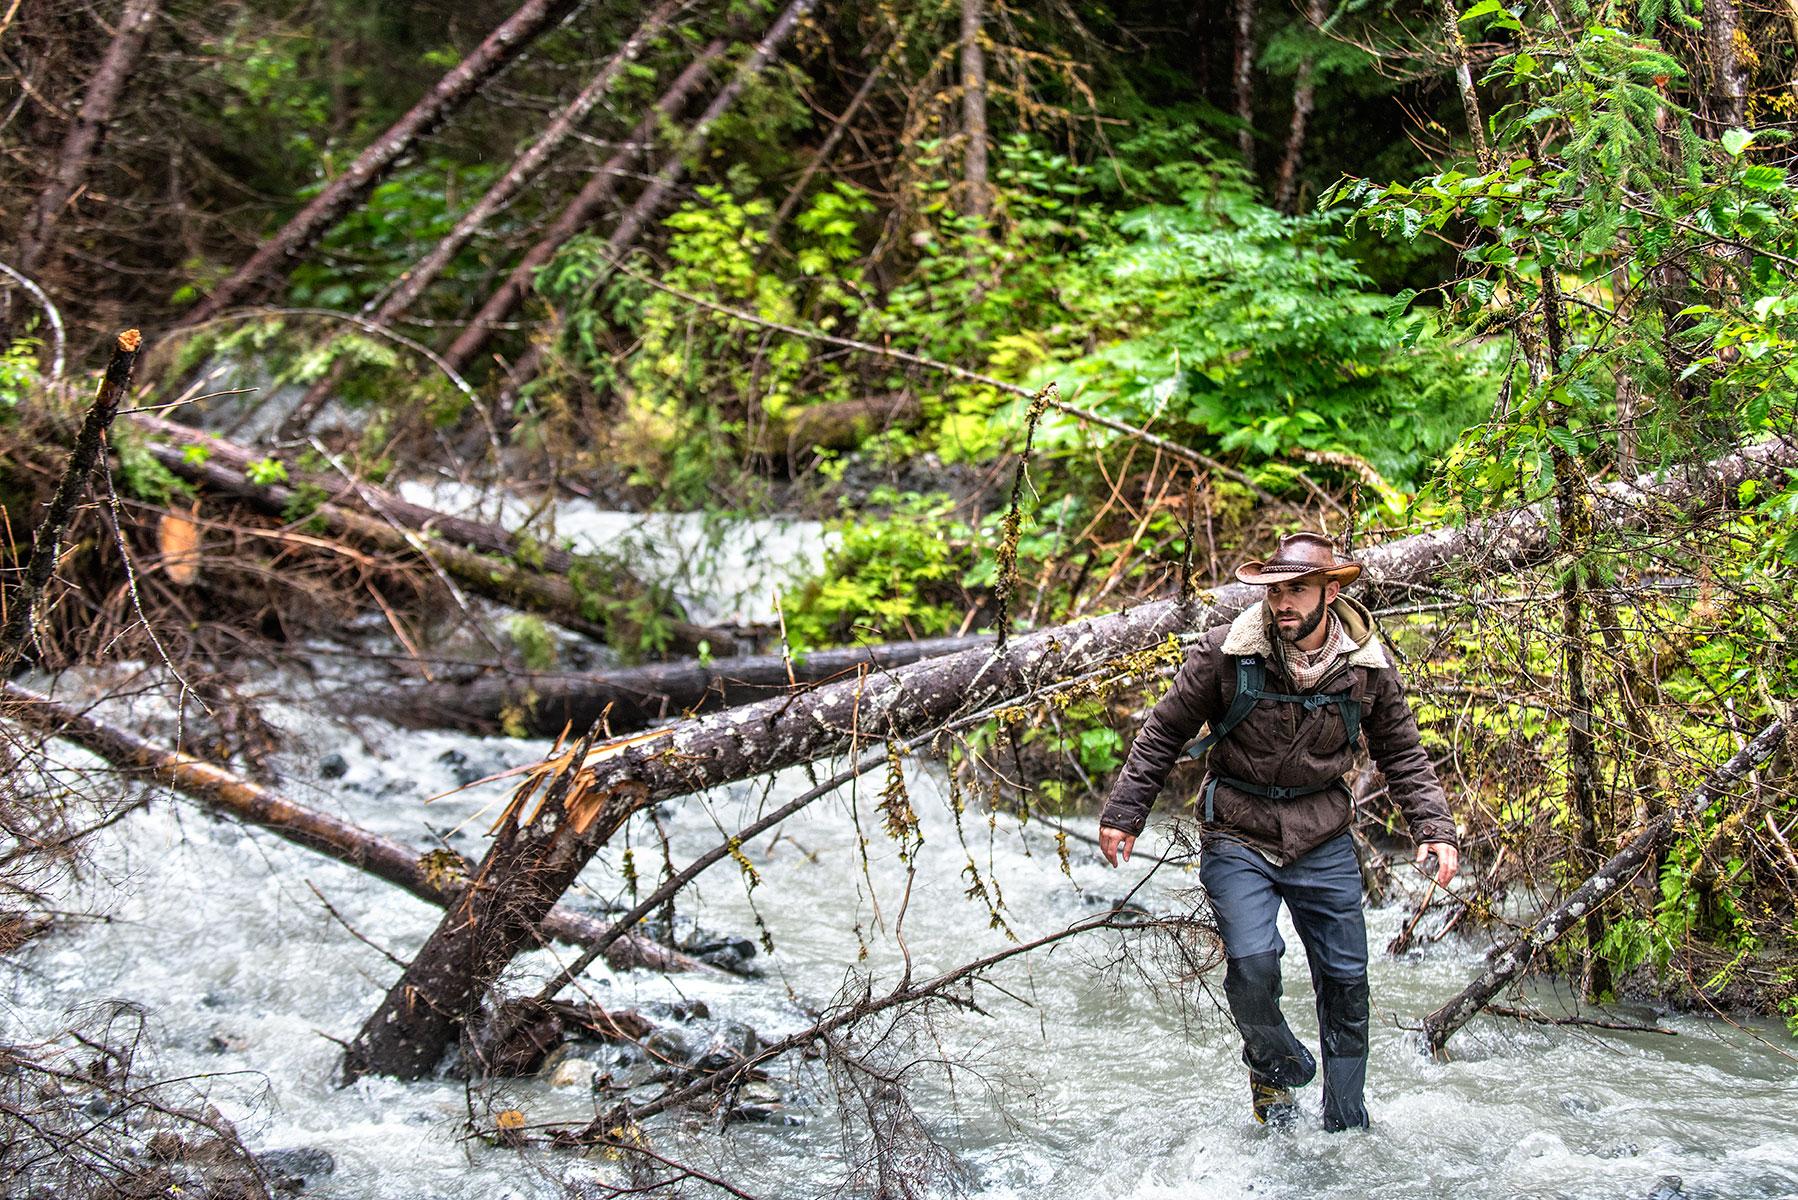 austin-trigg-brave-wilderness-alaska-BW-Coyote-Runs-Through-Stream.jpg